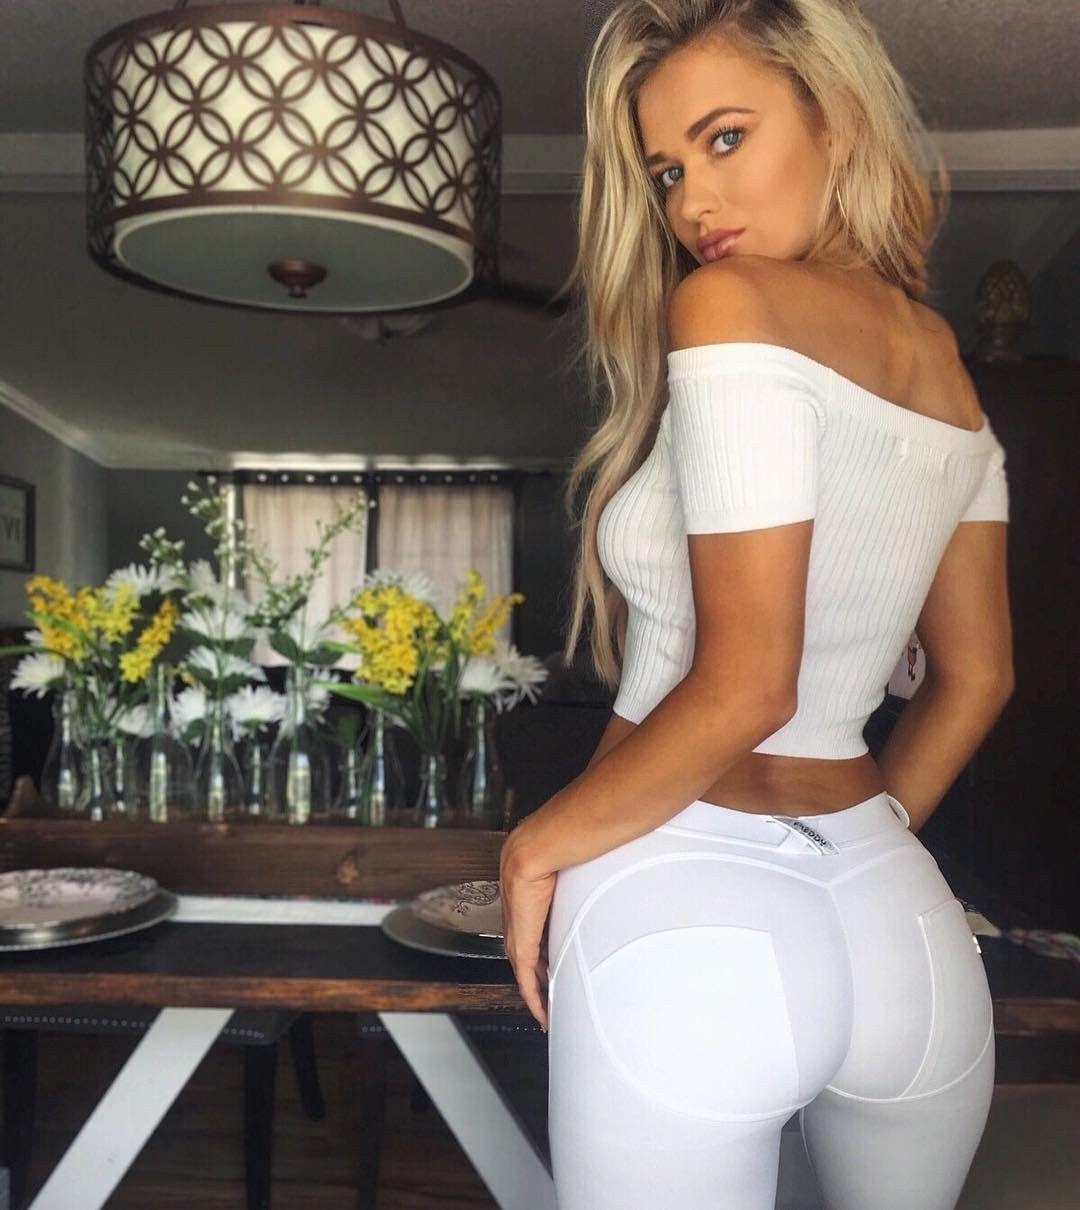 Sex Doll Dress | Dressed Slutty | Pinterest | White pants, White ...